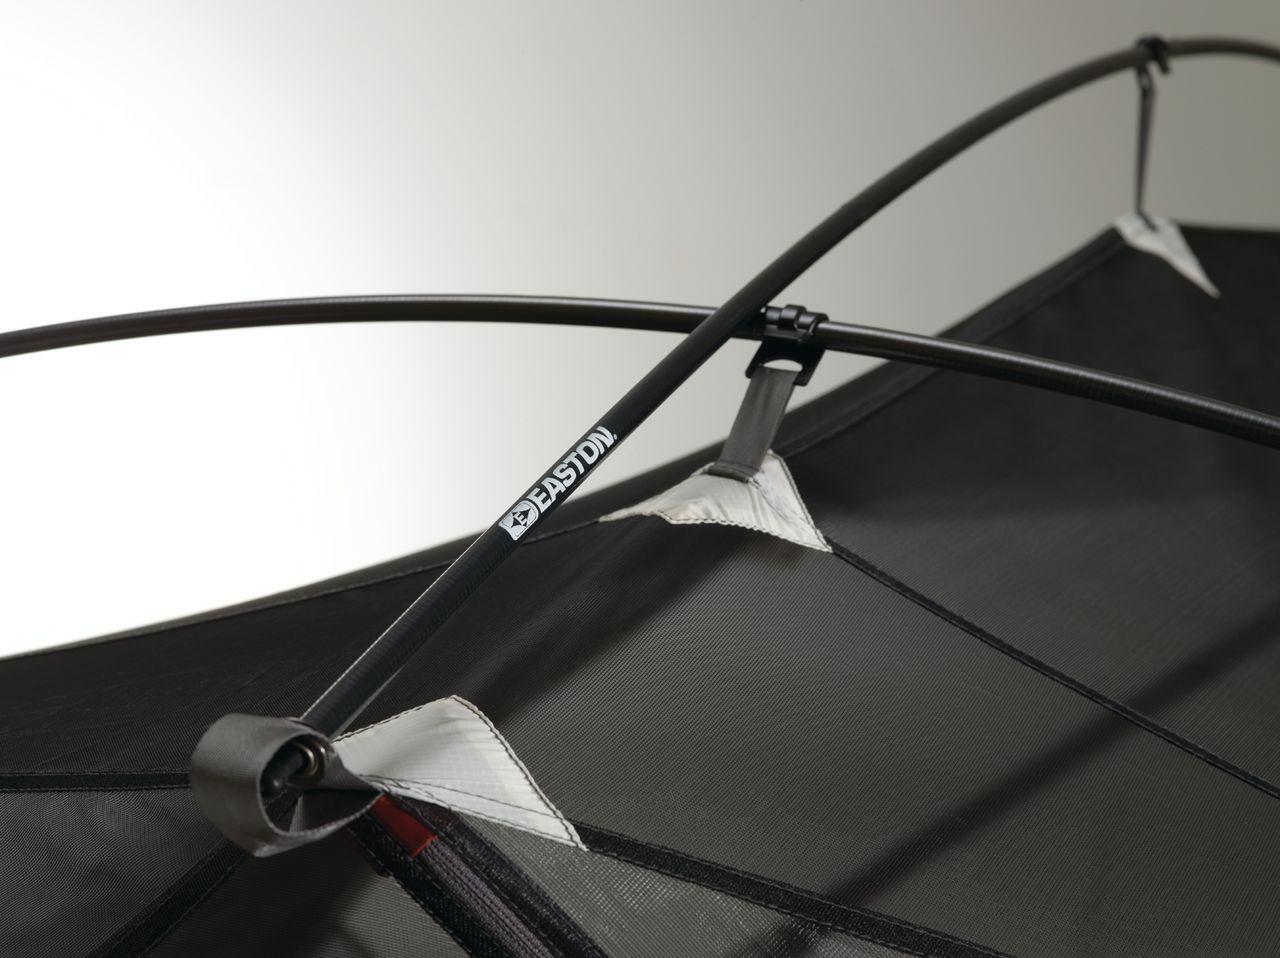 ... MSR Carbon Reflex 2 ... & Msr Carbon Reflex 2: Lightweight double-walled full-protection 2 ...